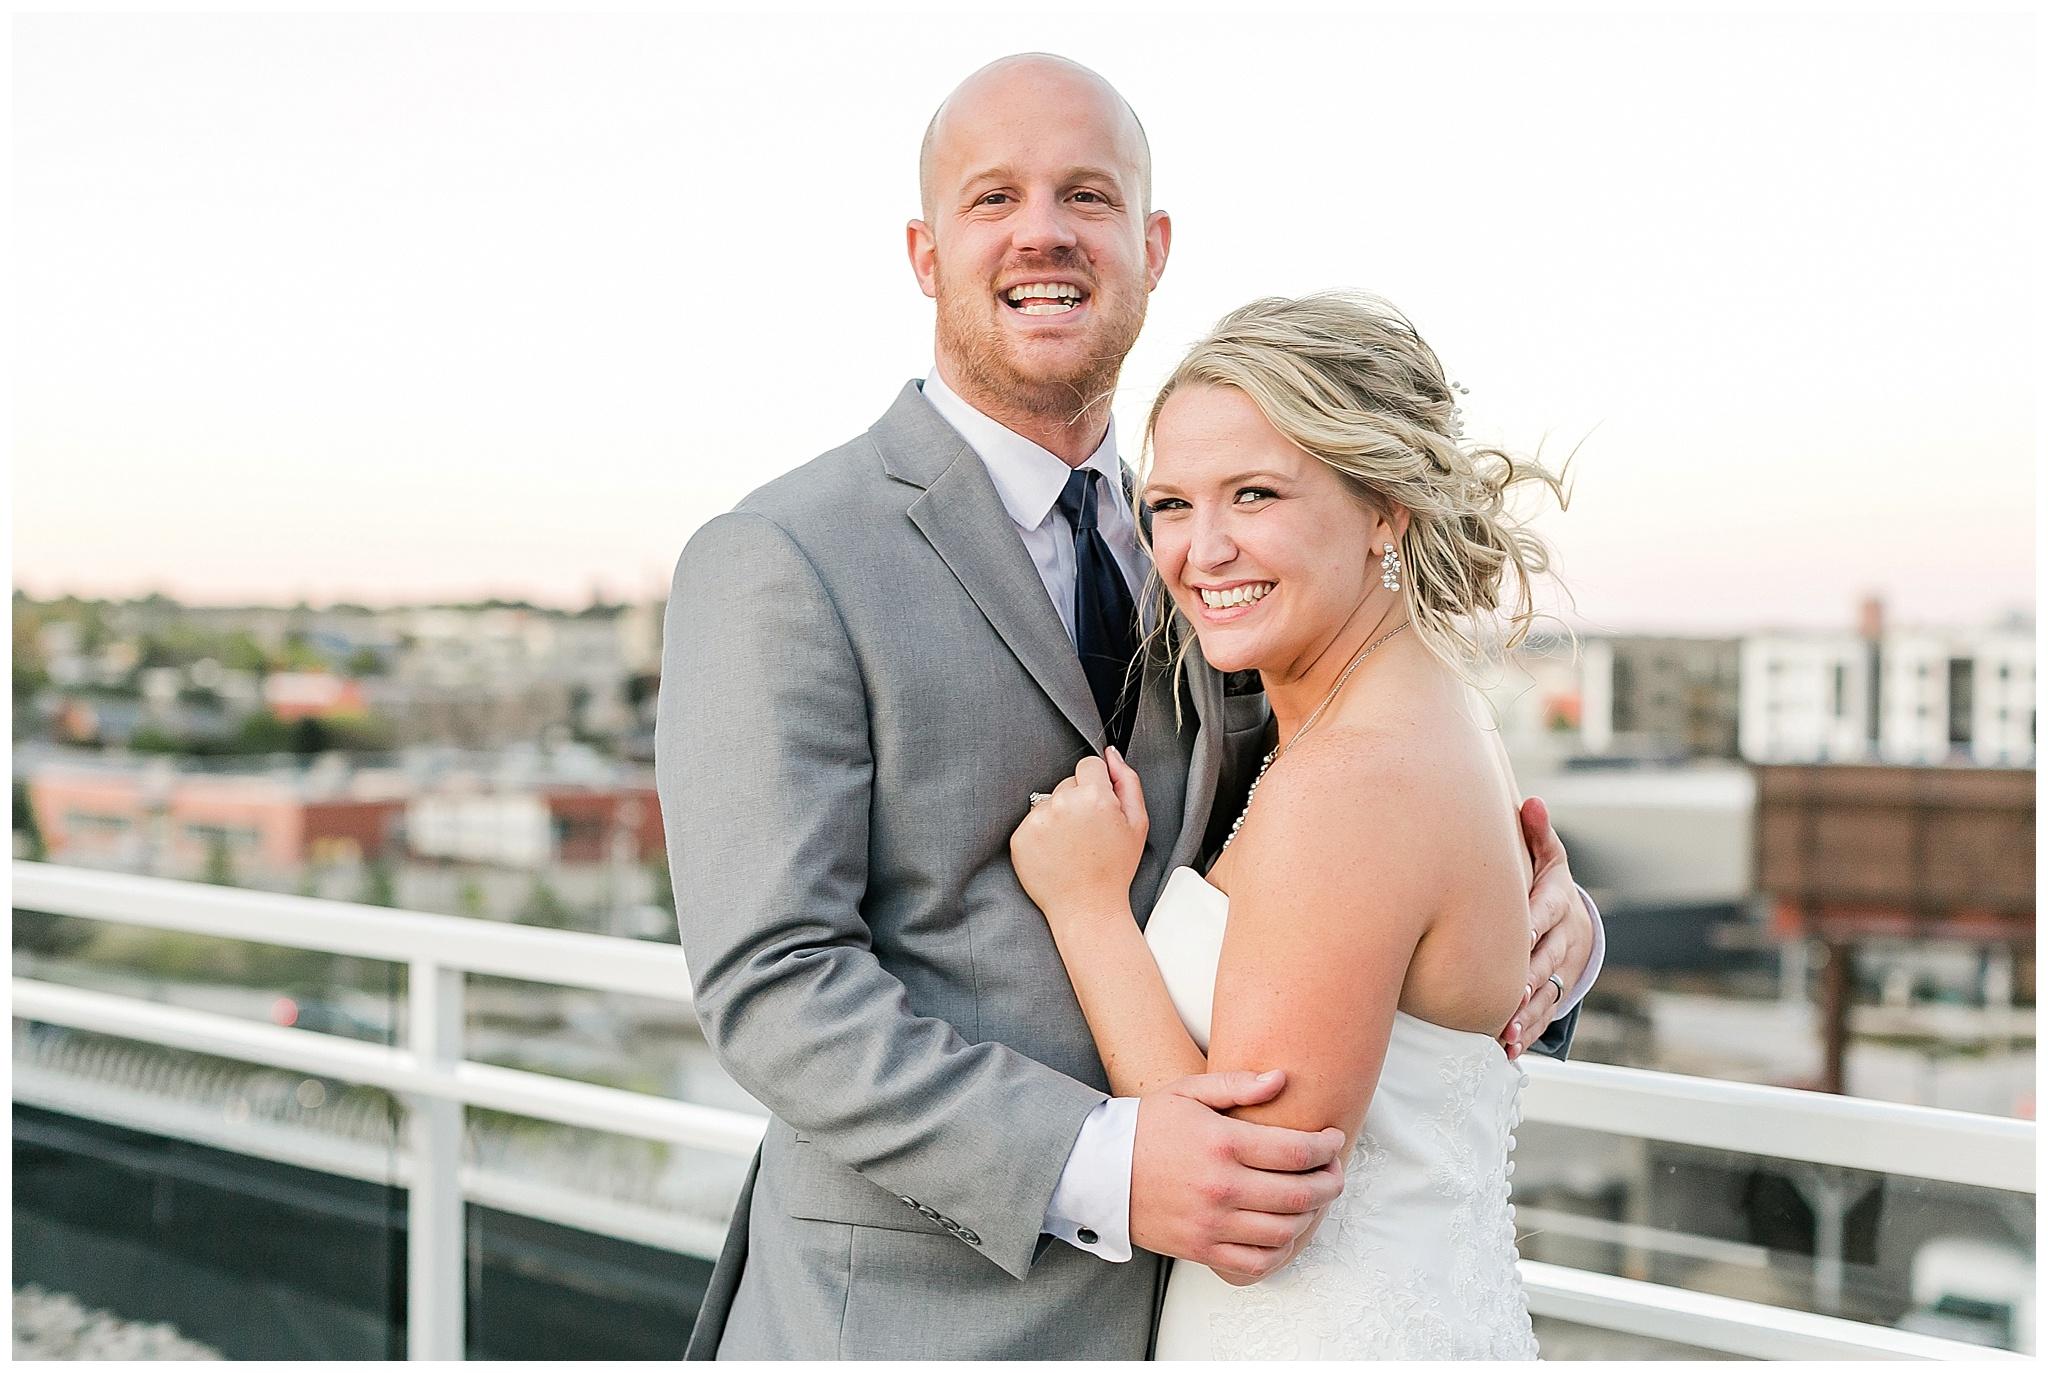 Venue_at_Milwaukee_Brewing_Company_wedding_milwaukee_wisconsin_0390.jpg